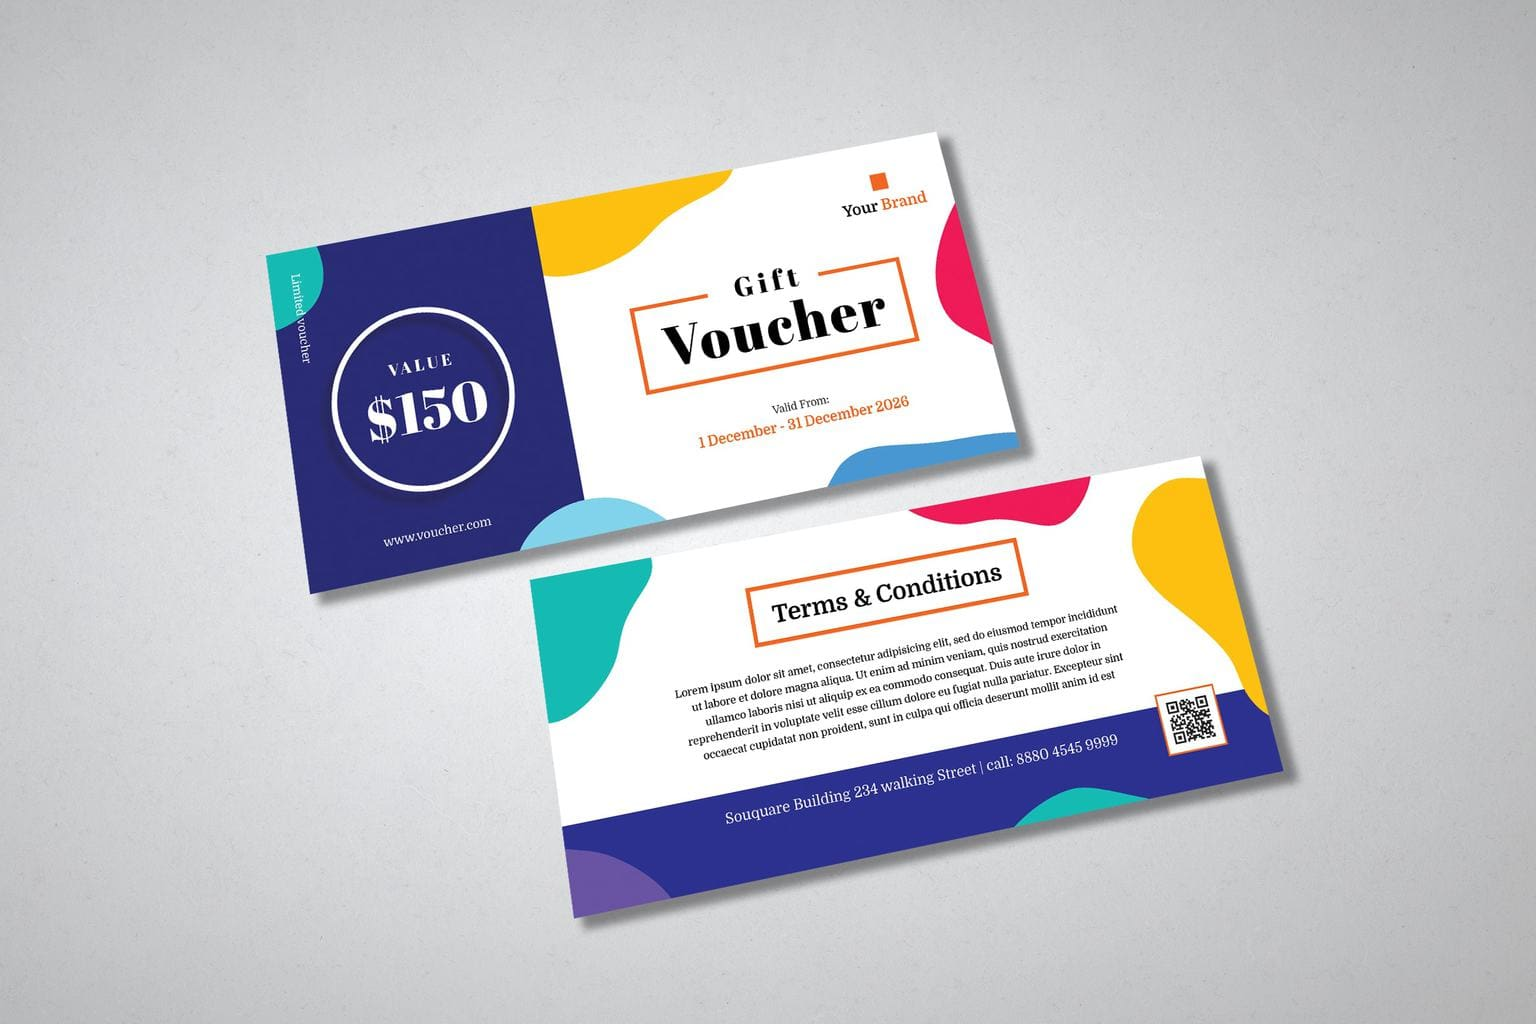 gift card voucher limited brand offer